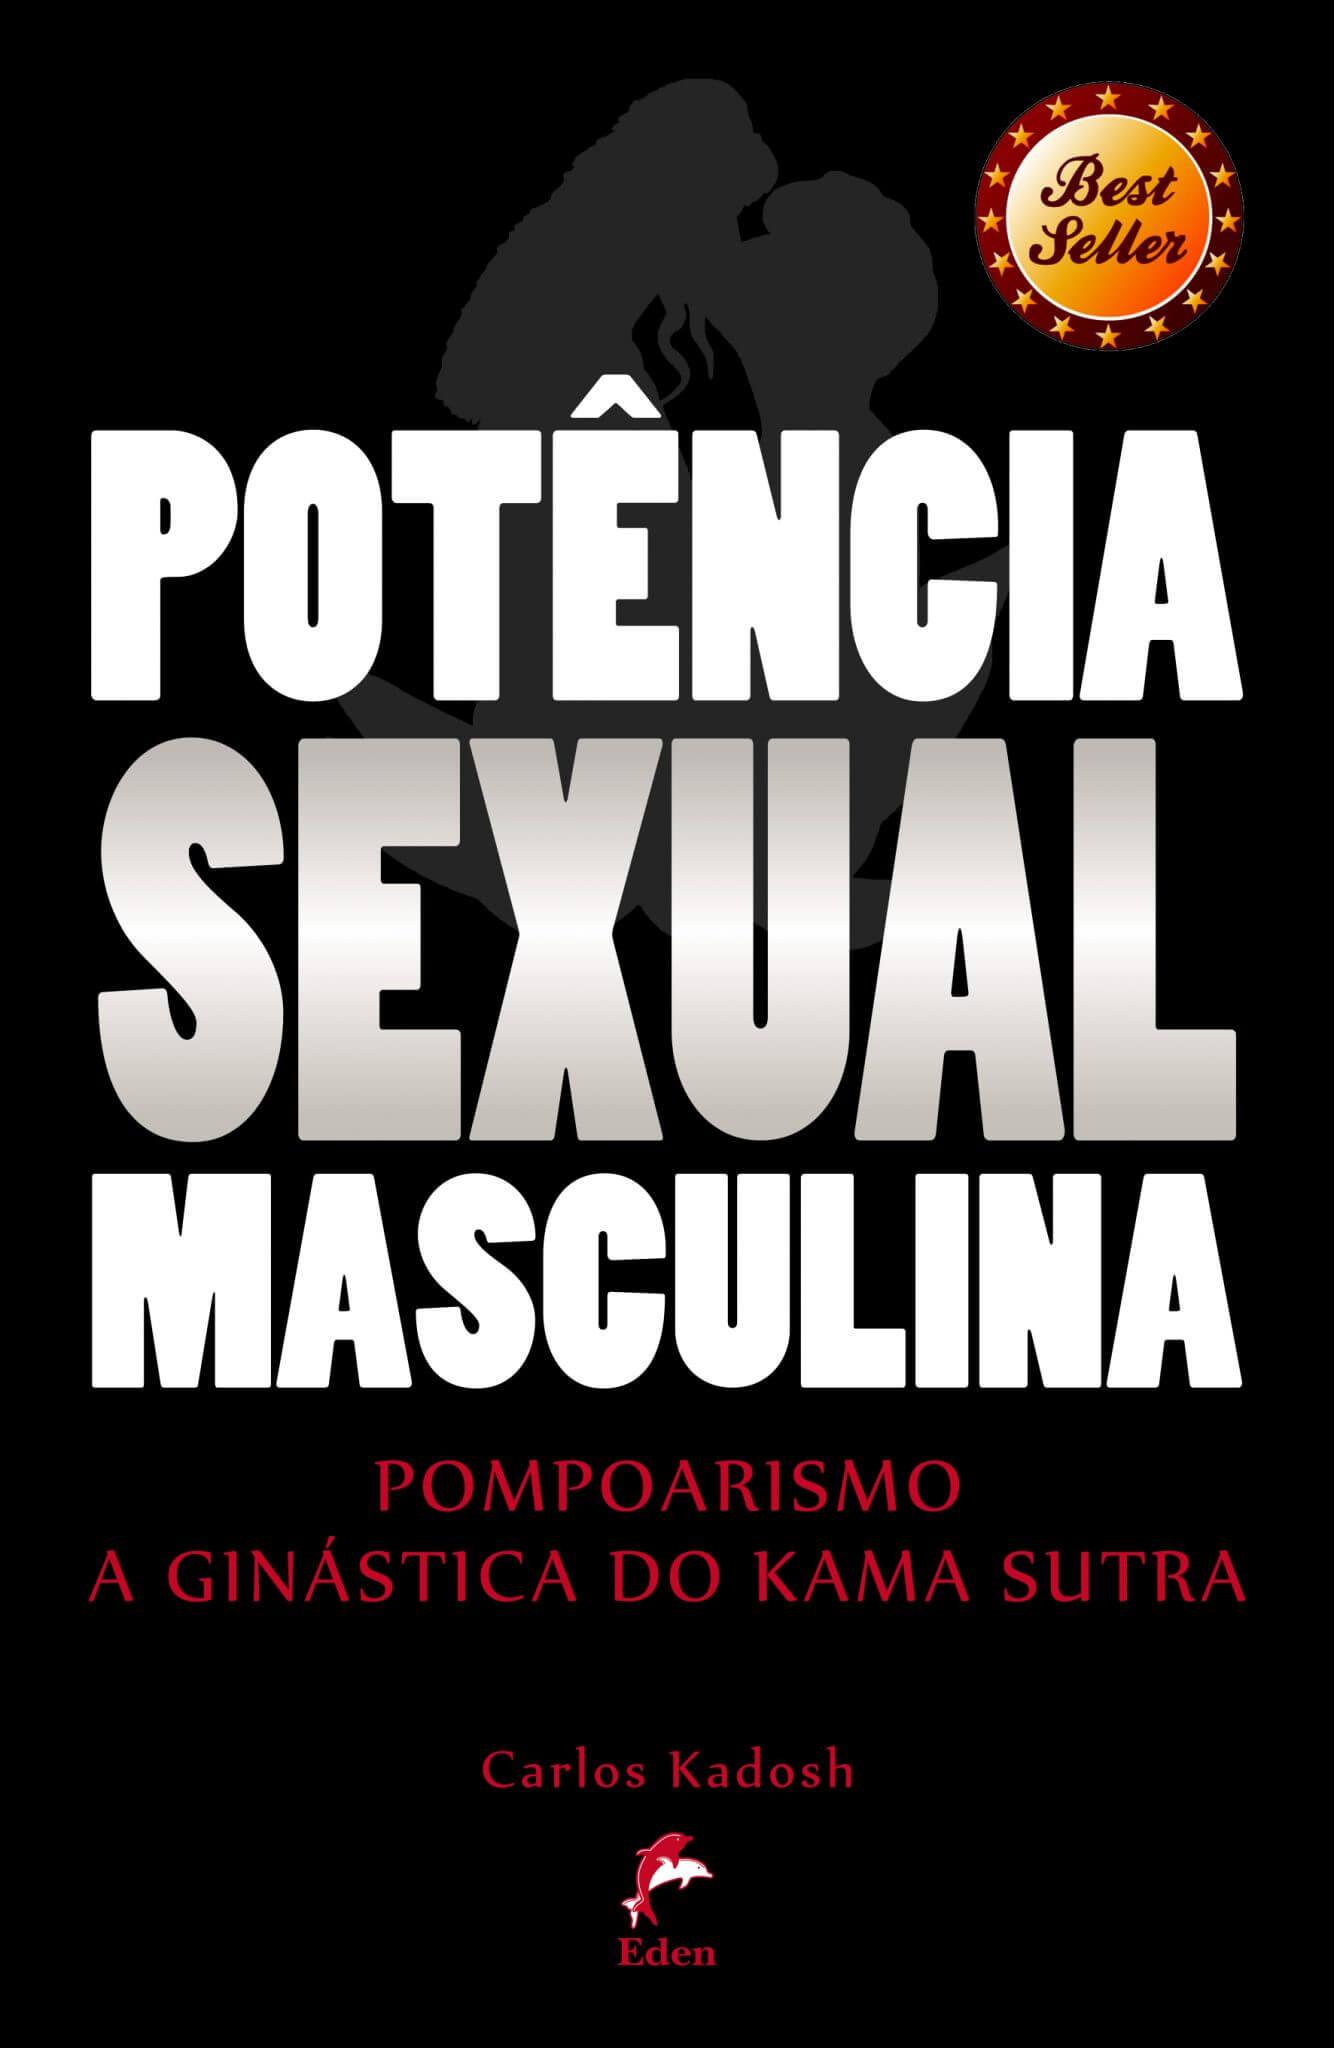 Potência Sexual Masculina: Pompoarismo – A Ginástica do Kama Sutra